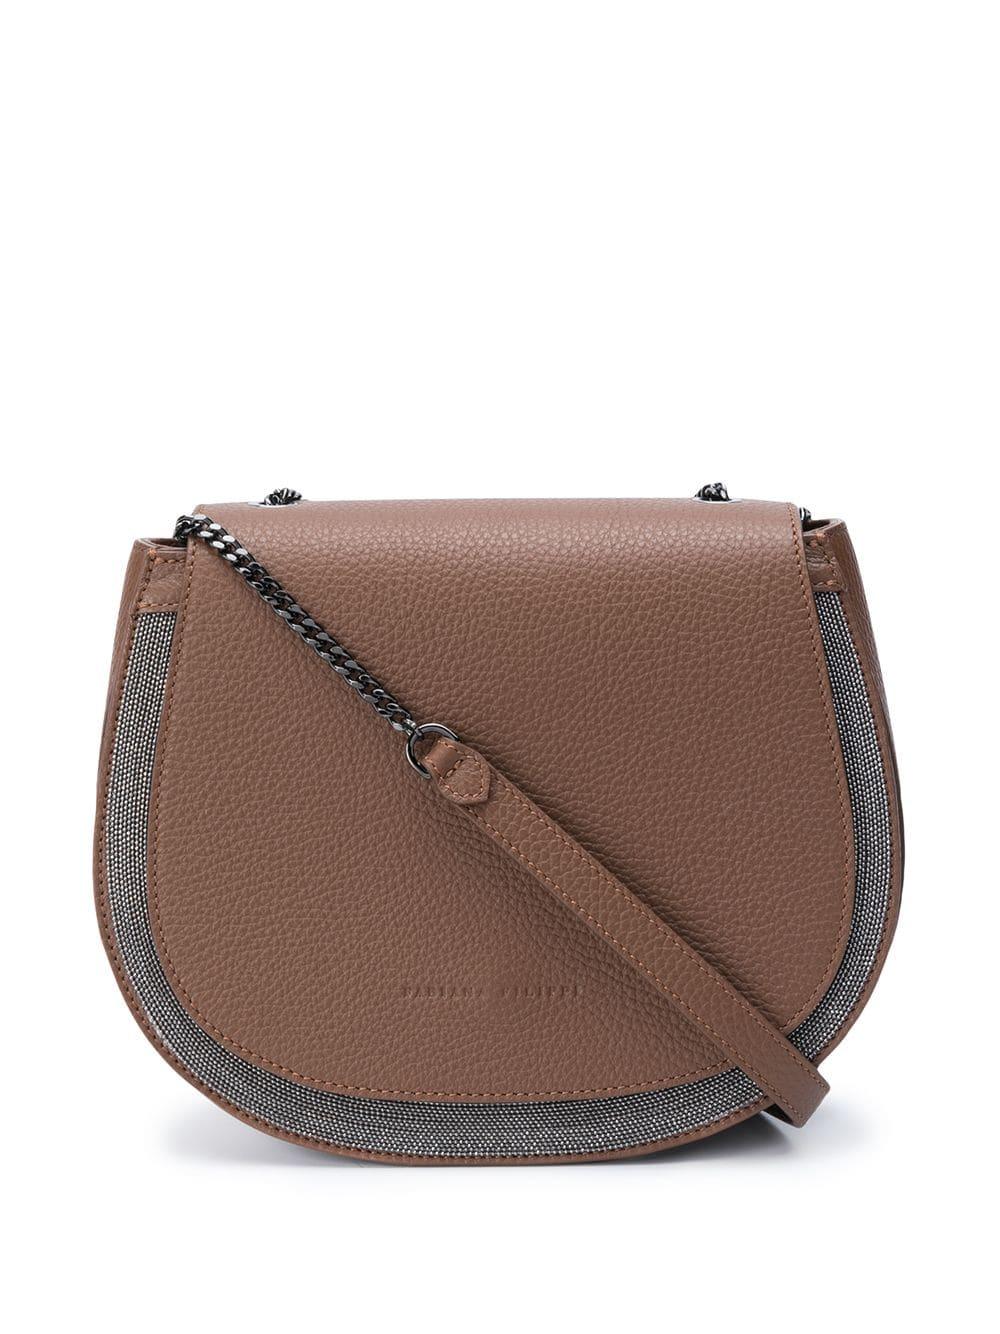 Adriana Leather Crossbody Bag